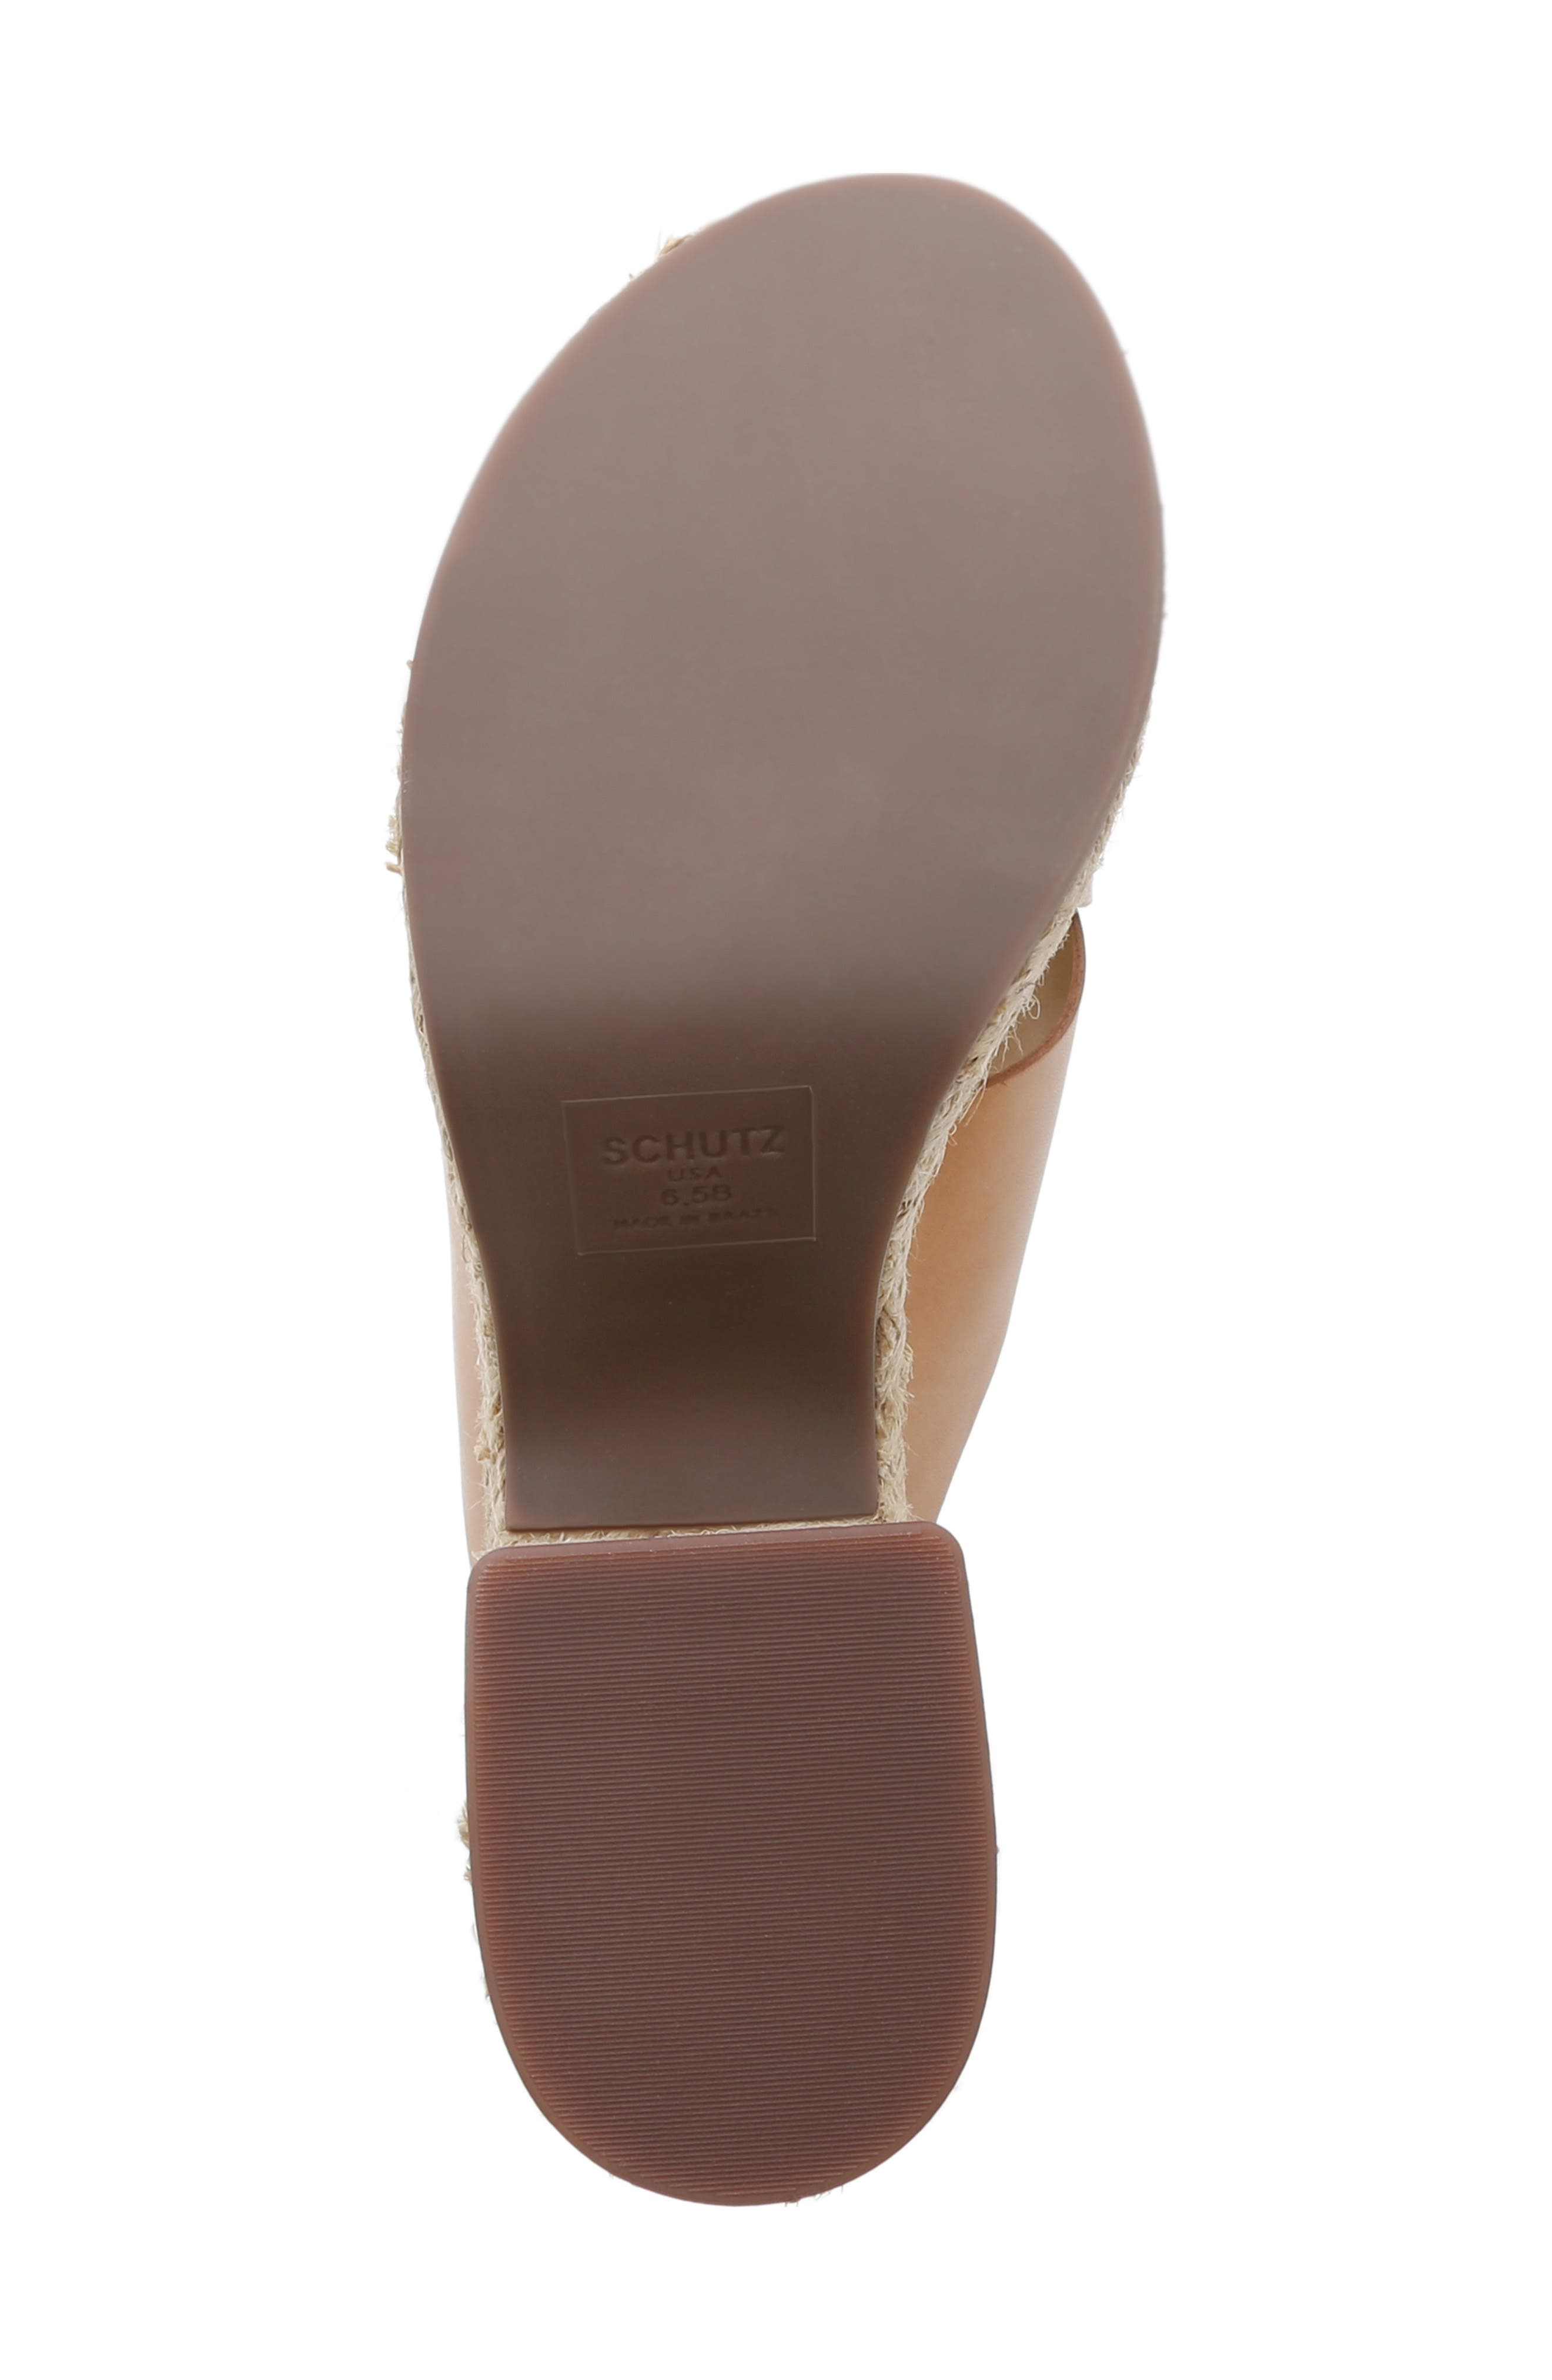 Lora Platform Wedge Sandal,                             Alternate thumbnail 6, color,                             HONEY BEIGE LEATHER